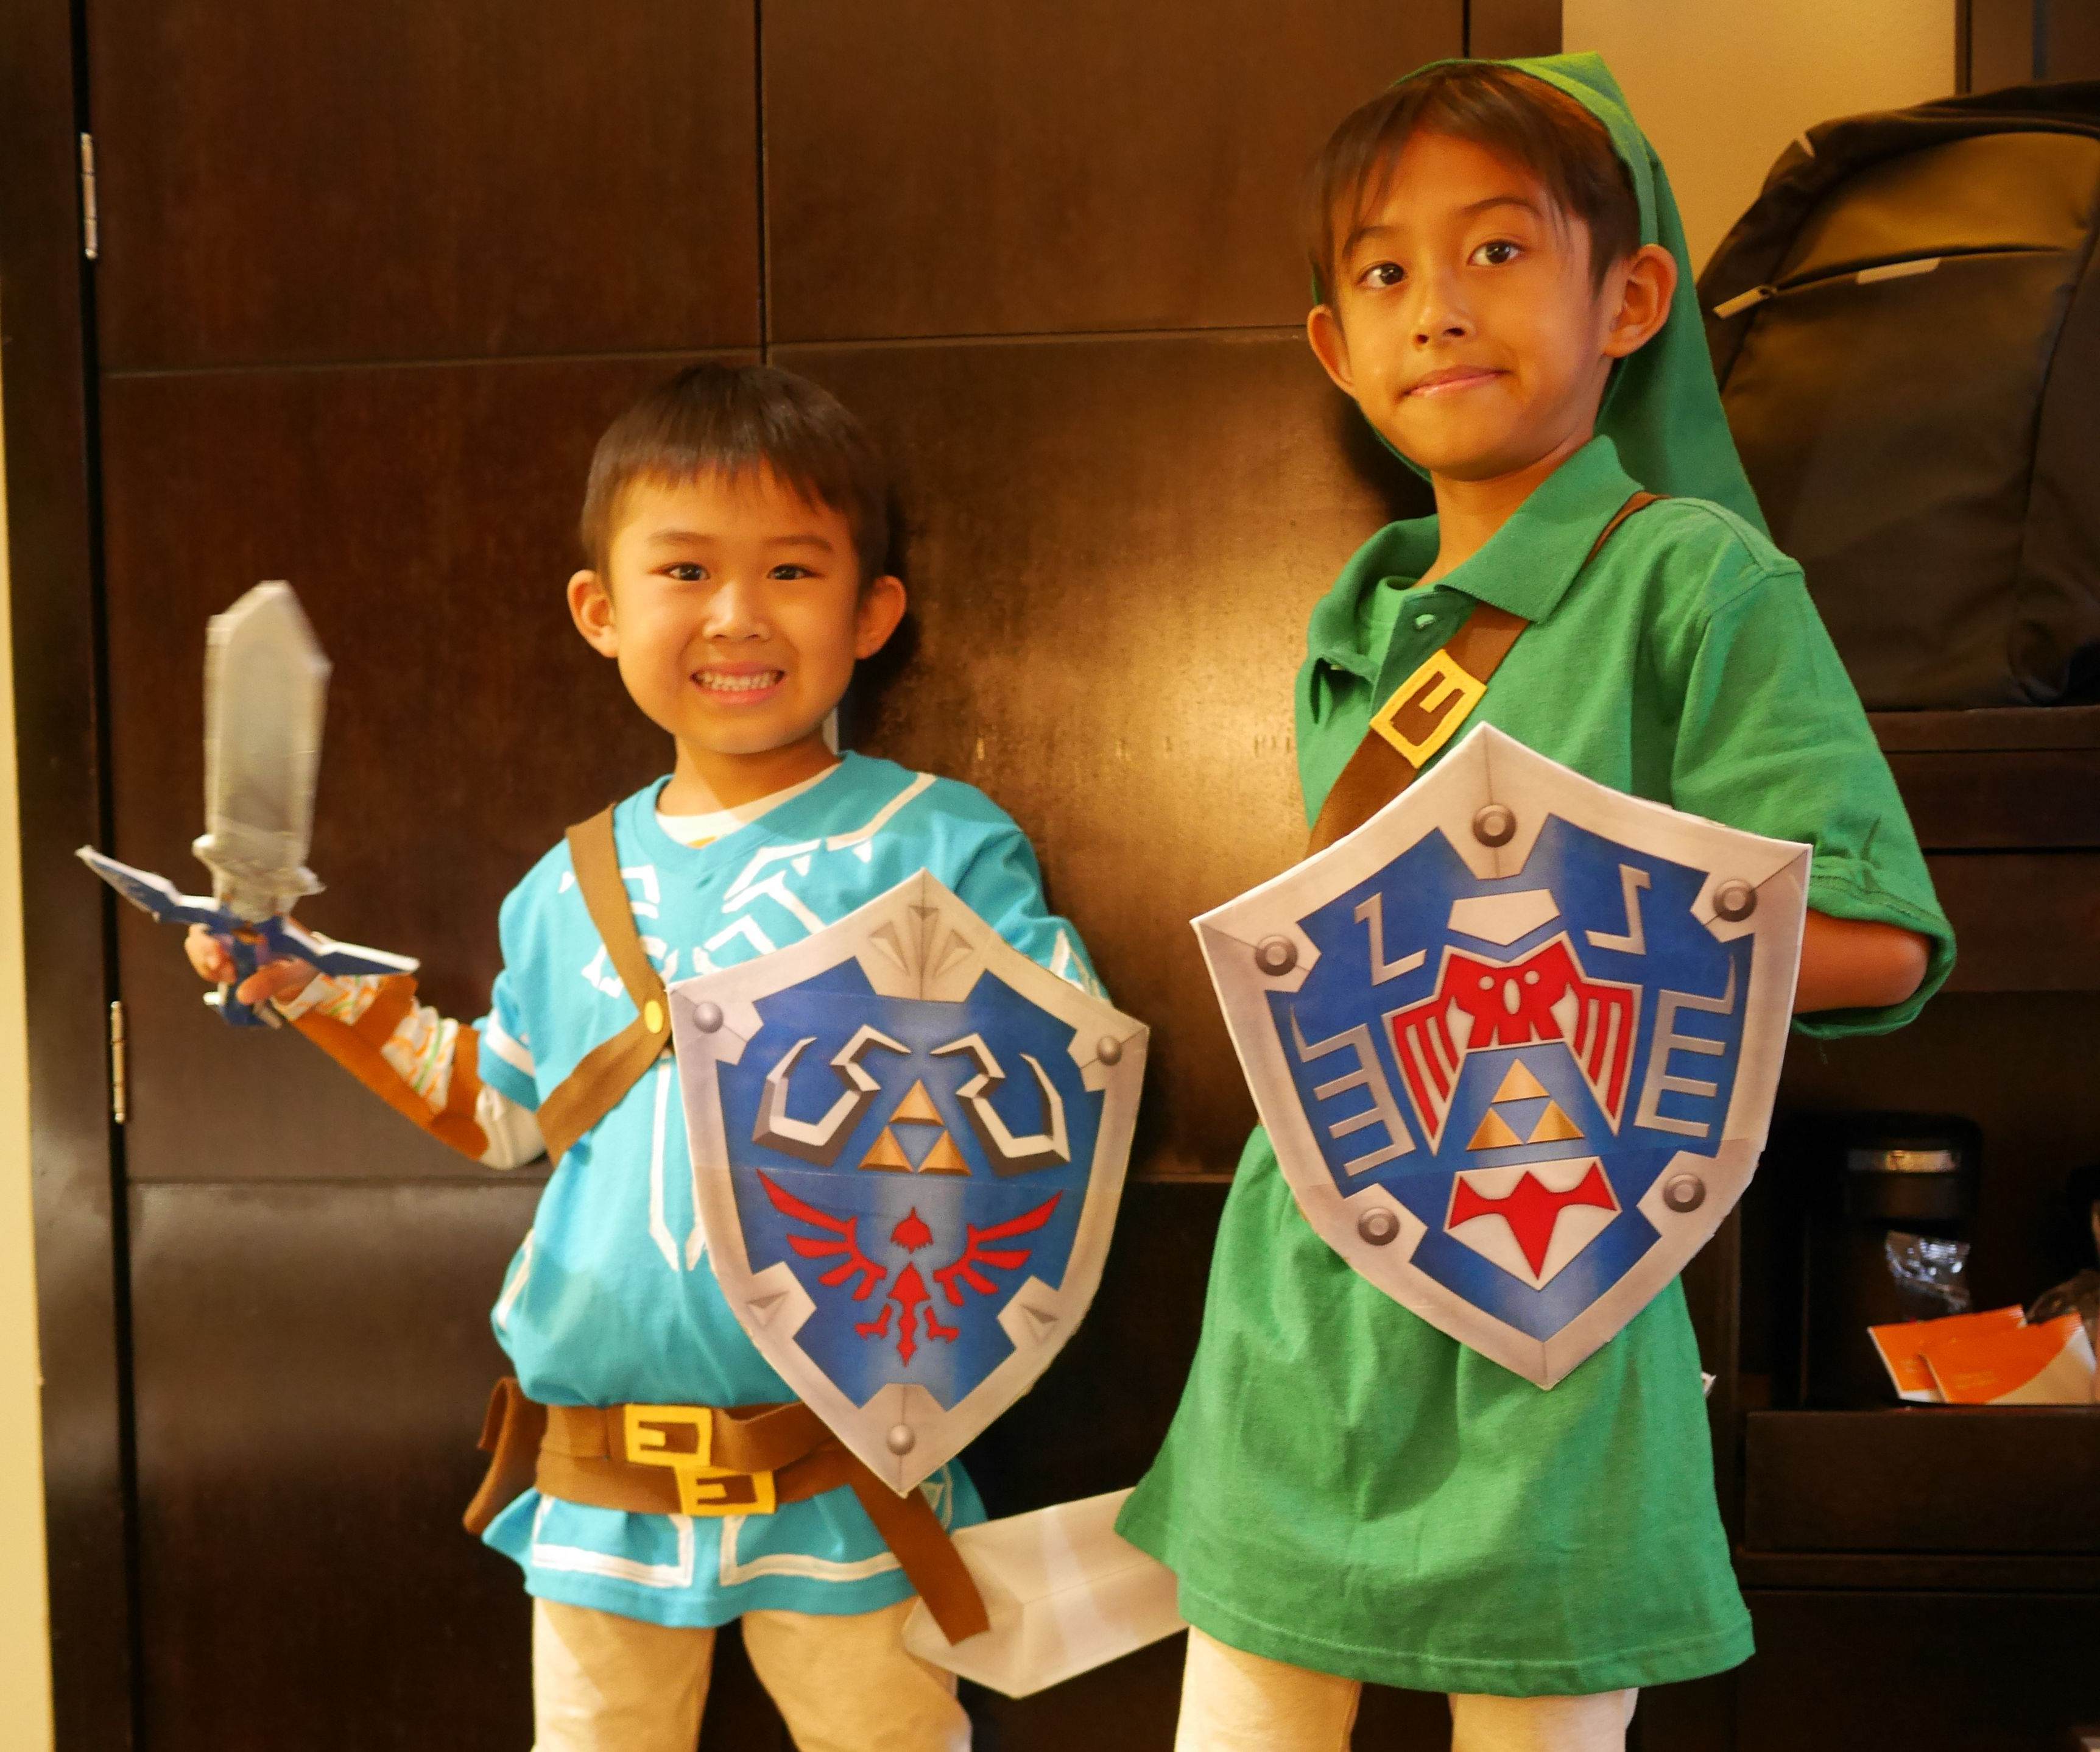 DIY LINK COSTUMES: Legend of Zelda - Breath of the Wild & Majora's Mask